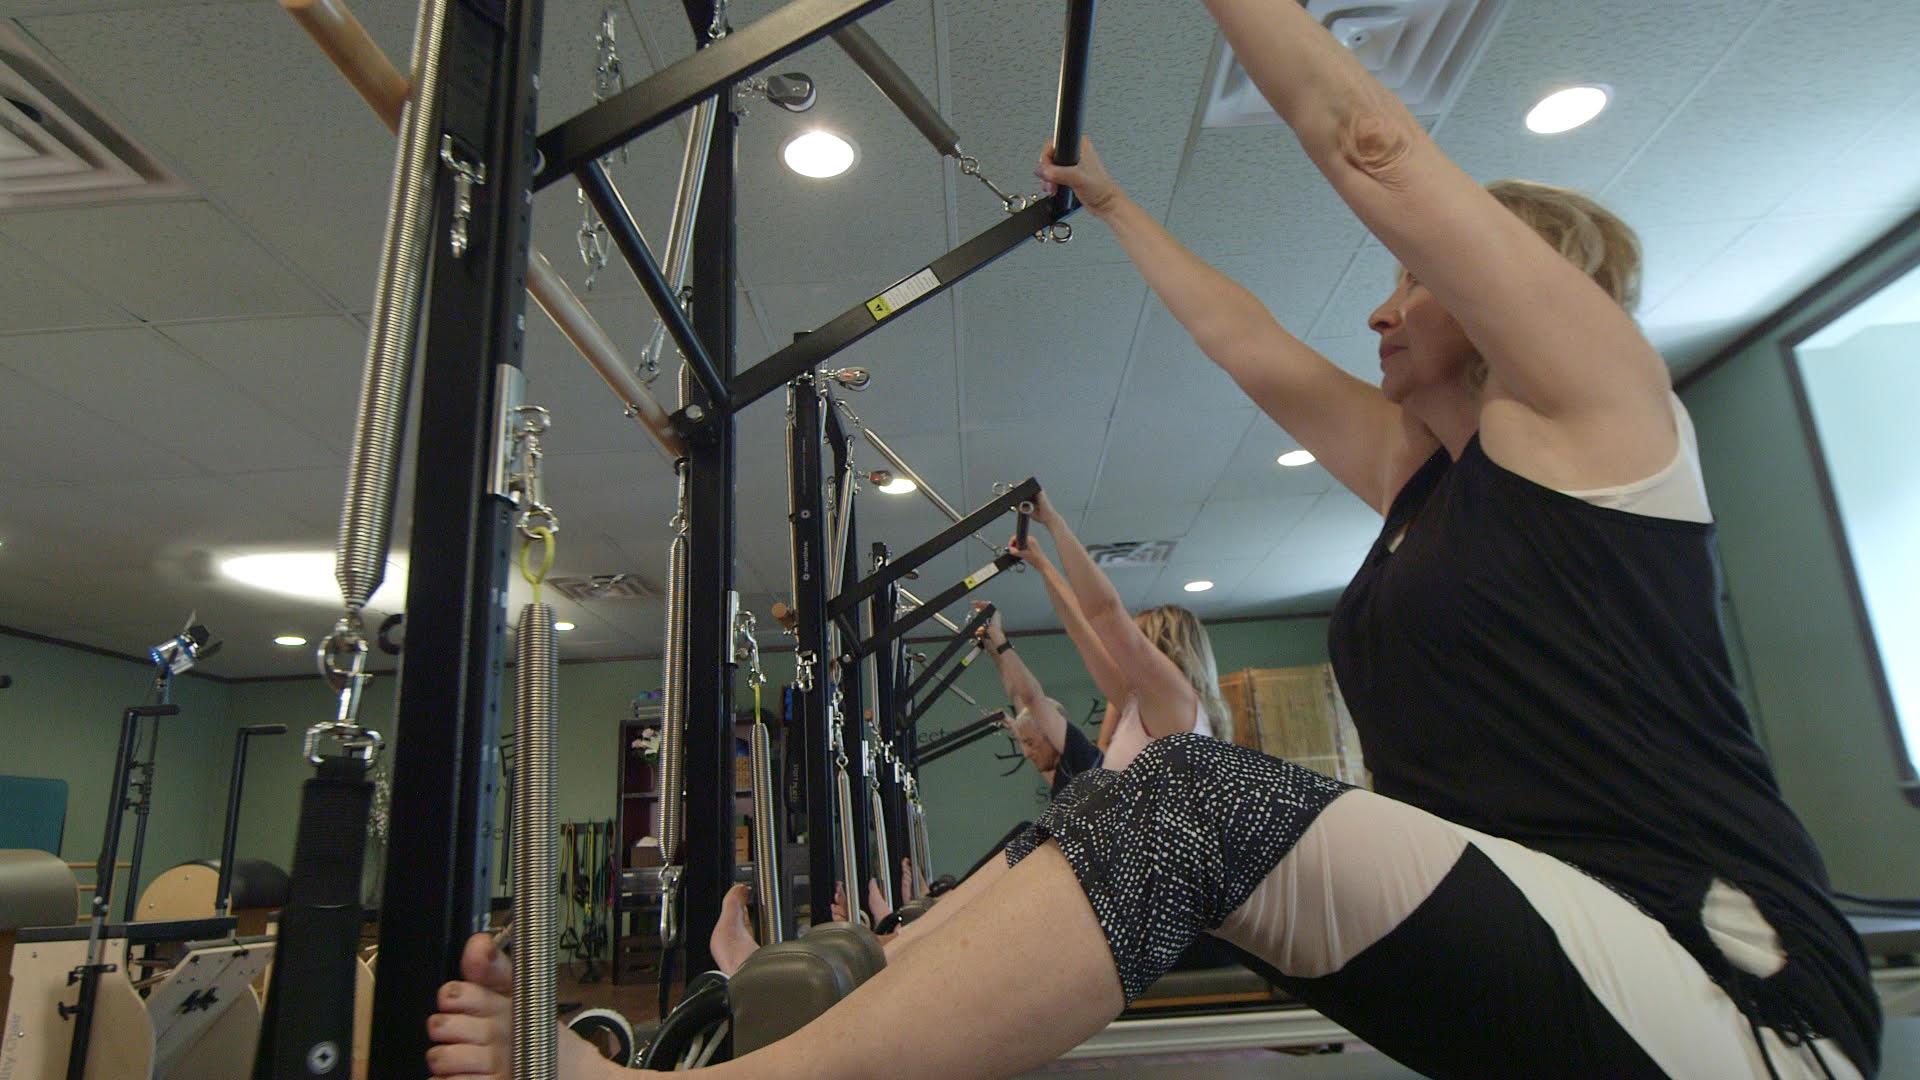 Senior Fitness - Flexibility